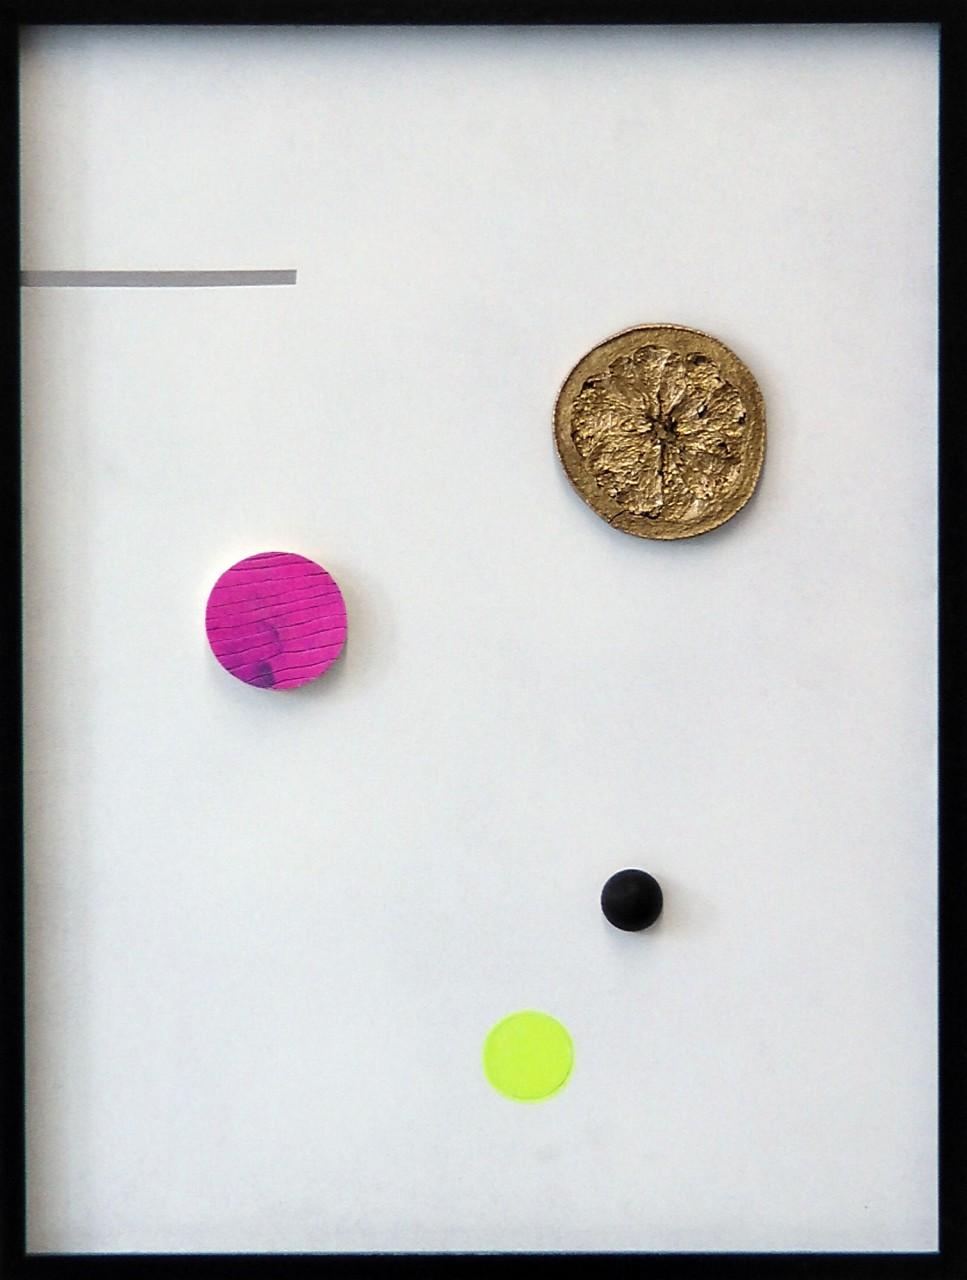 untitled, mixed media on panel, 40x30 cm, 2014